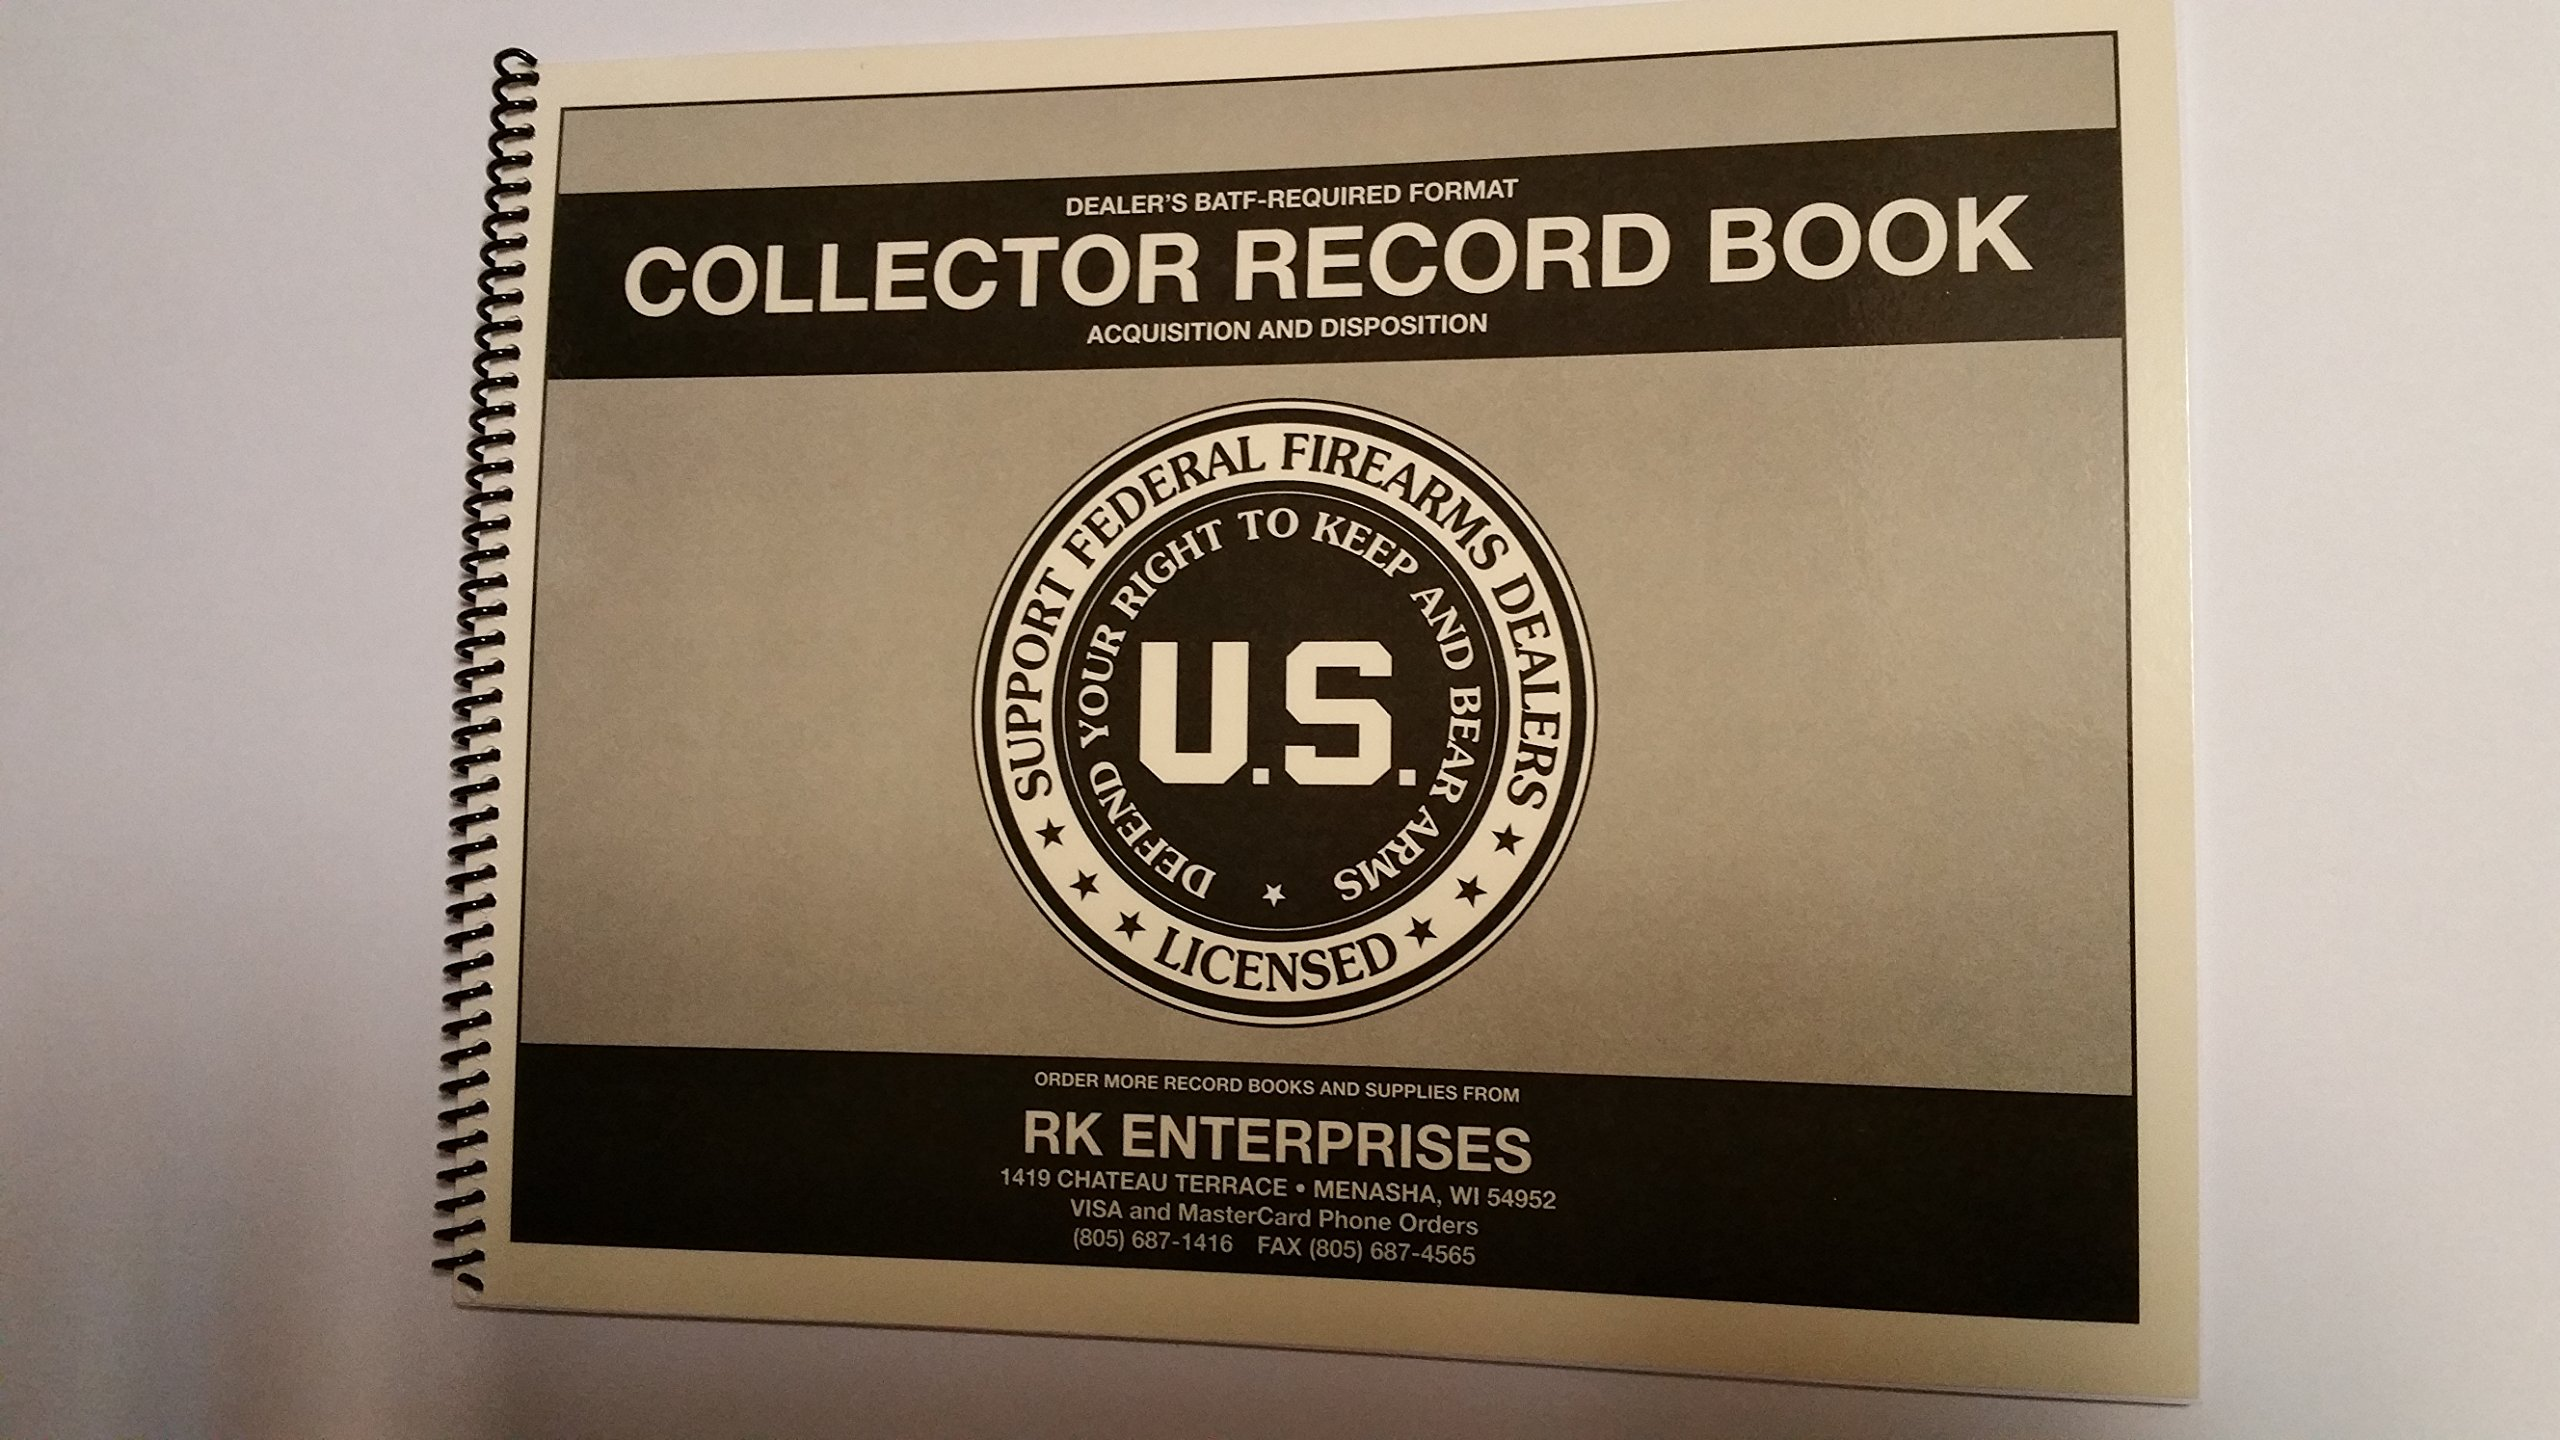 C&R Curio & Relic FFL 03 Bound Book for Collectors (300 Entry)